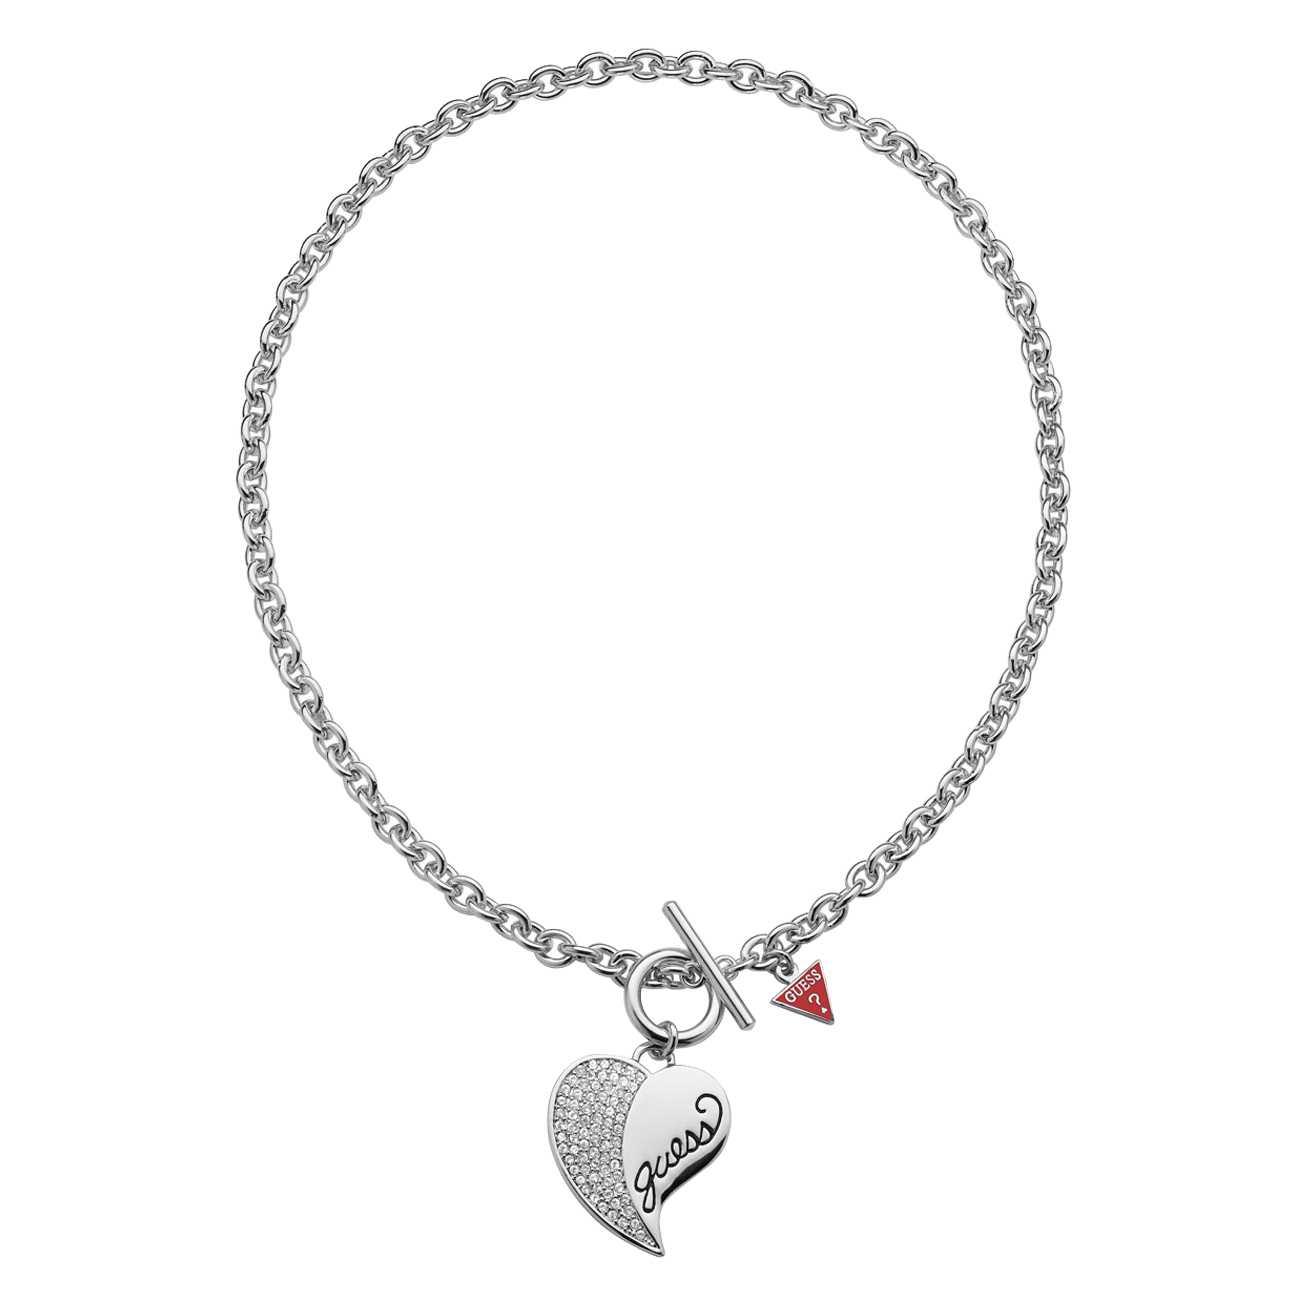 HEART PENDANT UBS11413 imagine produs